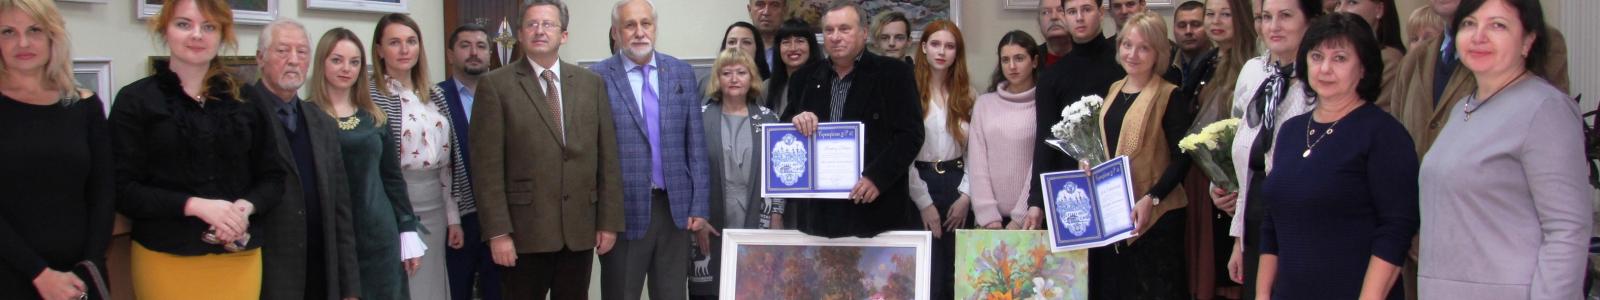 Gallery Painter Alina Slavgorodskaya